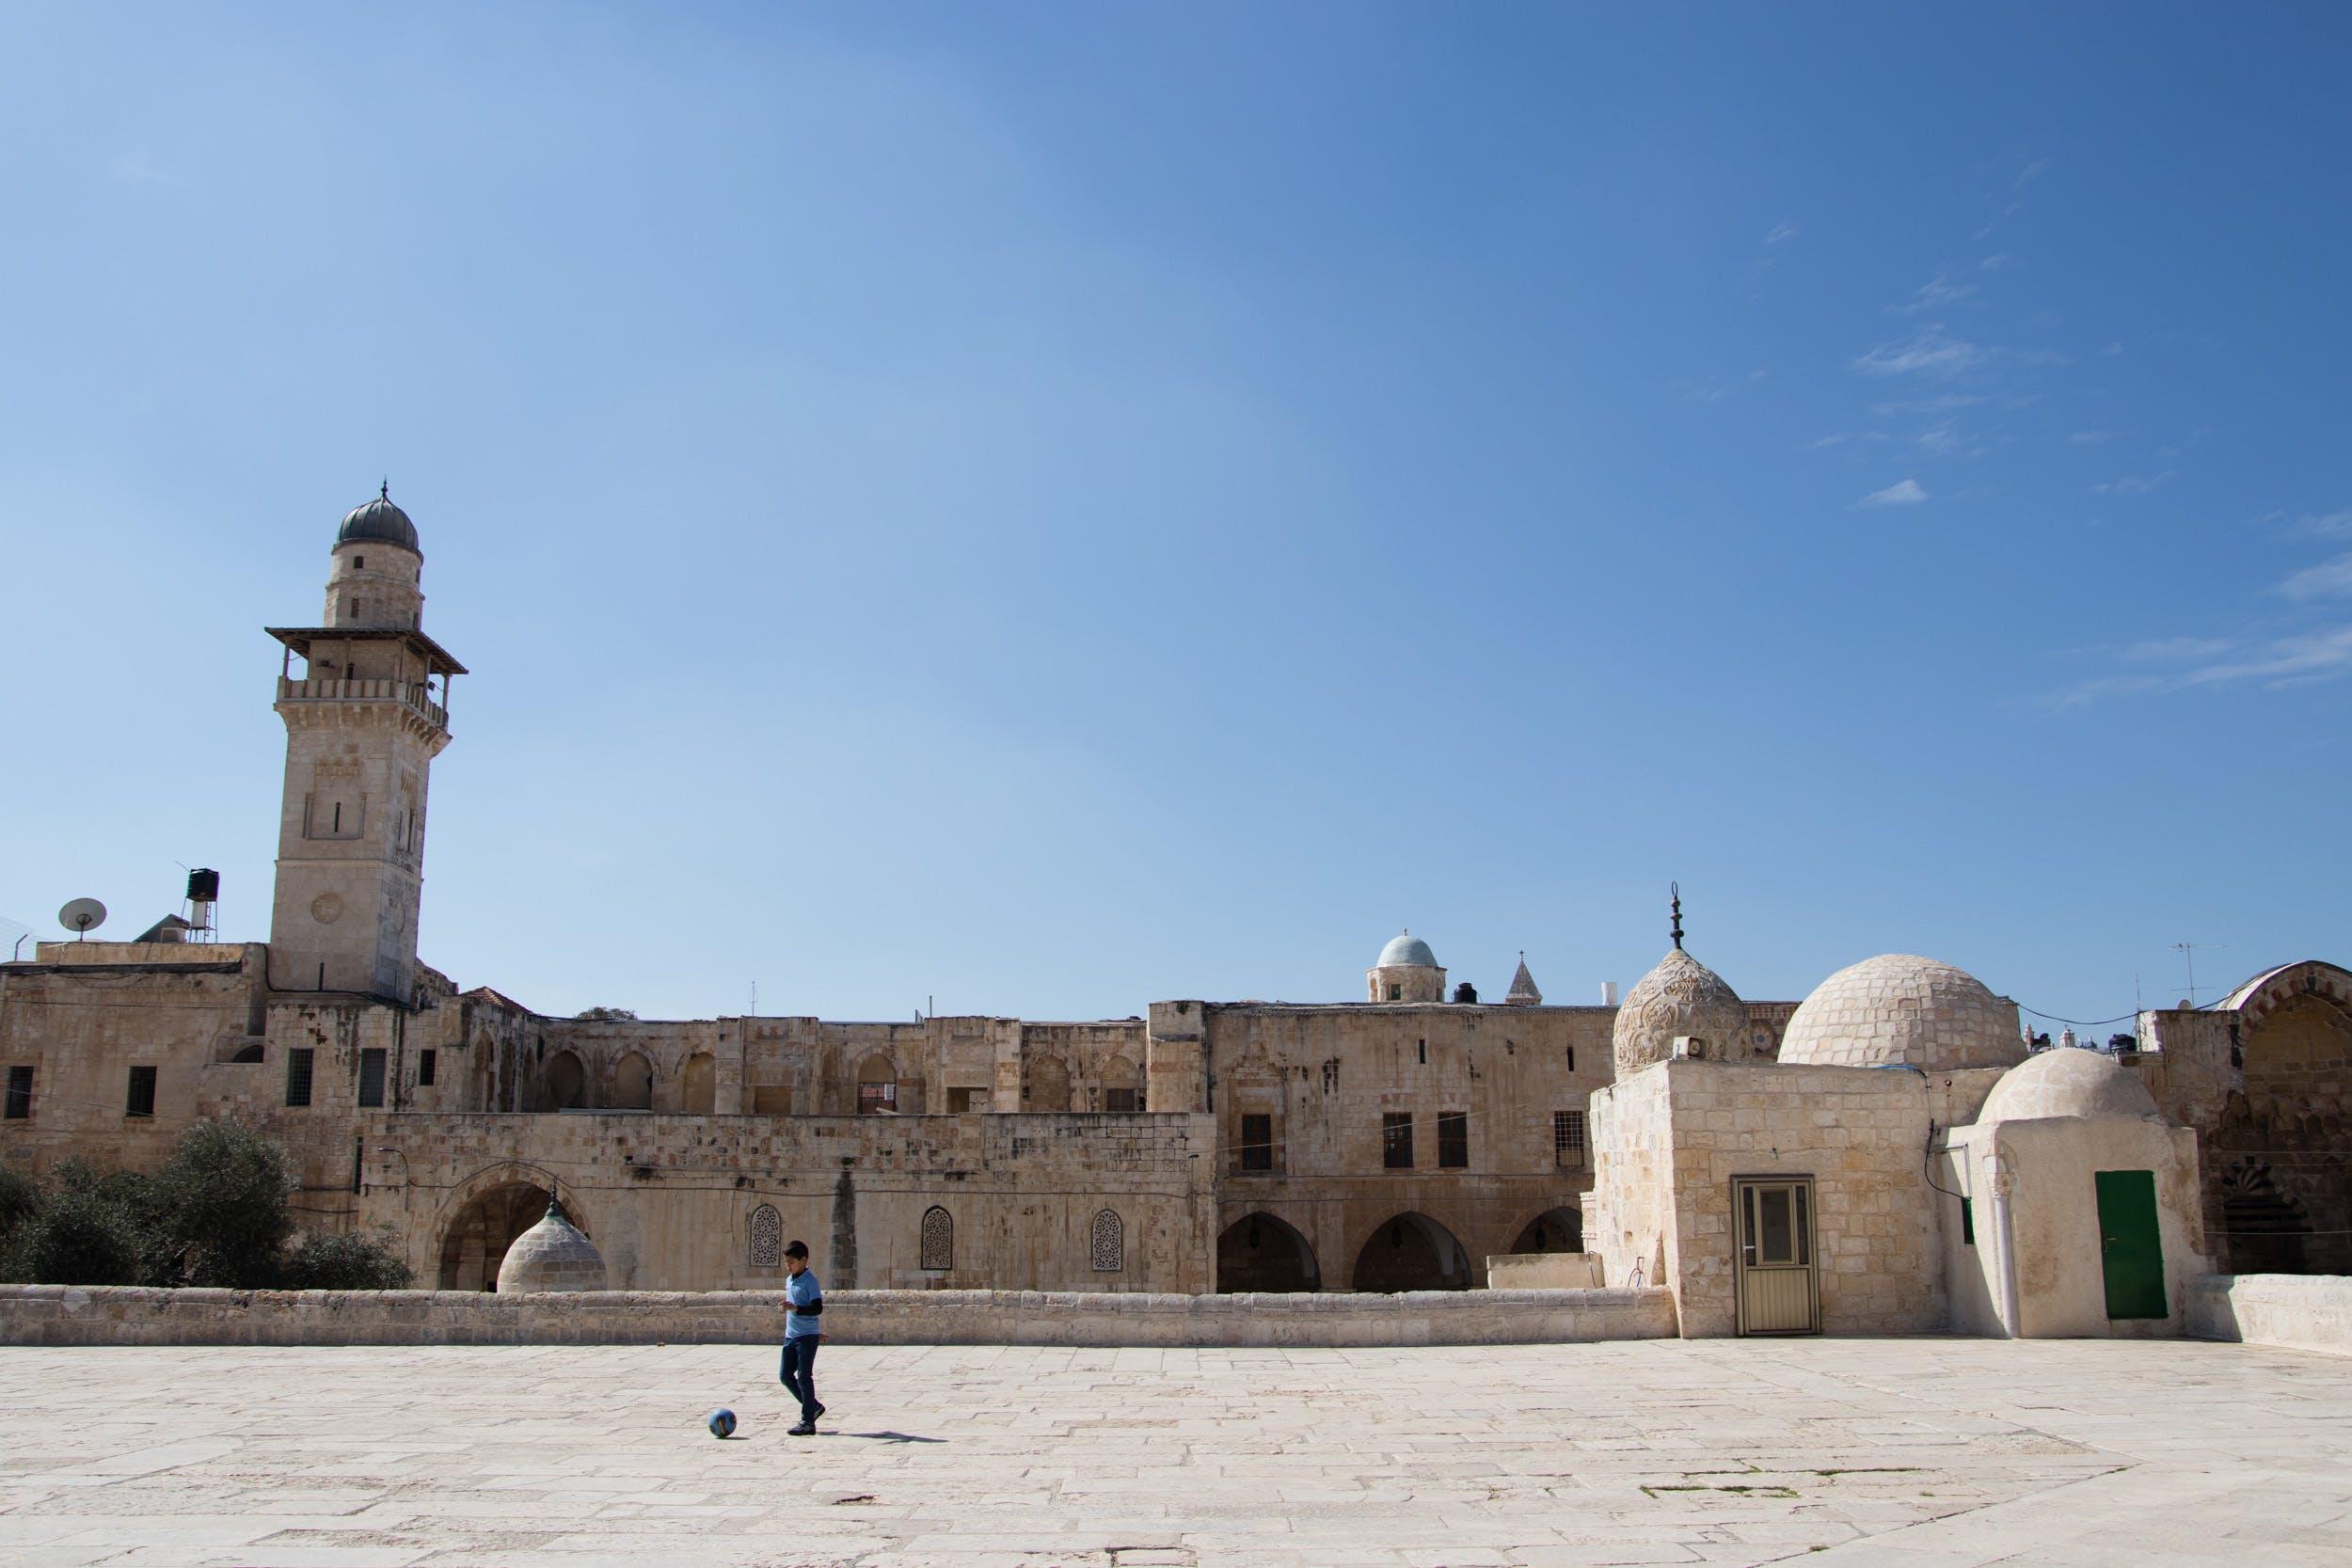 Man Playing Ball Near White Concrete Mosque